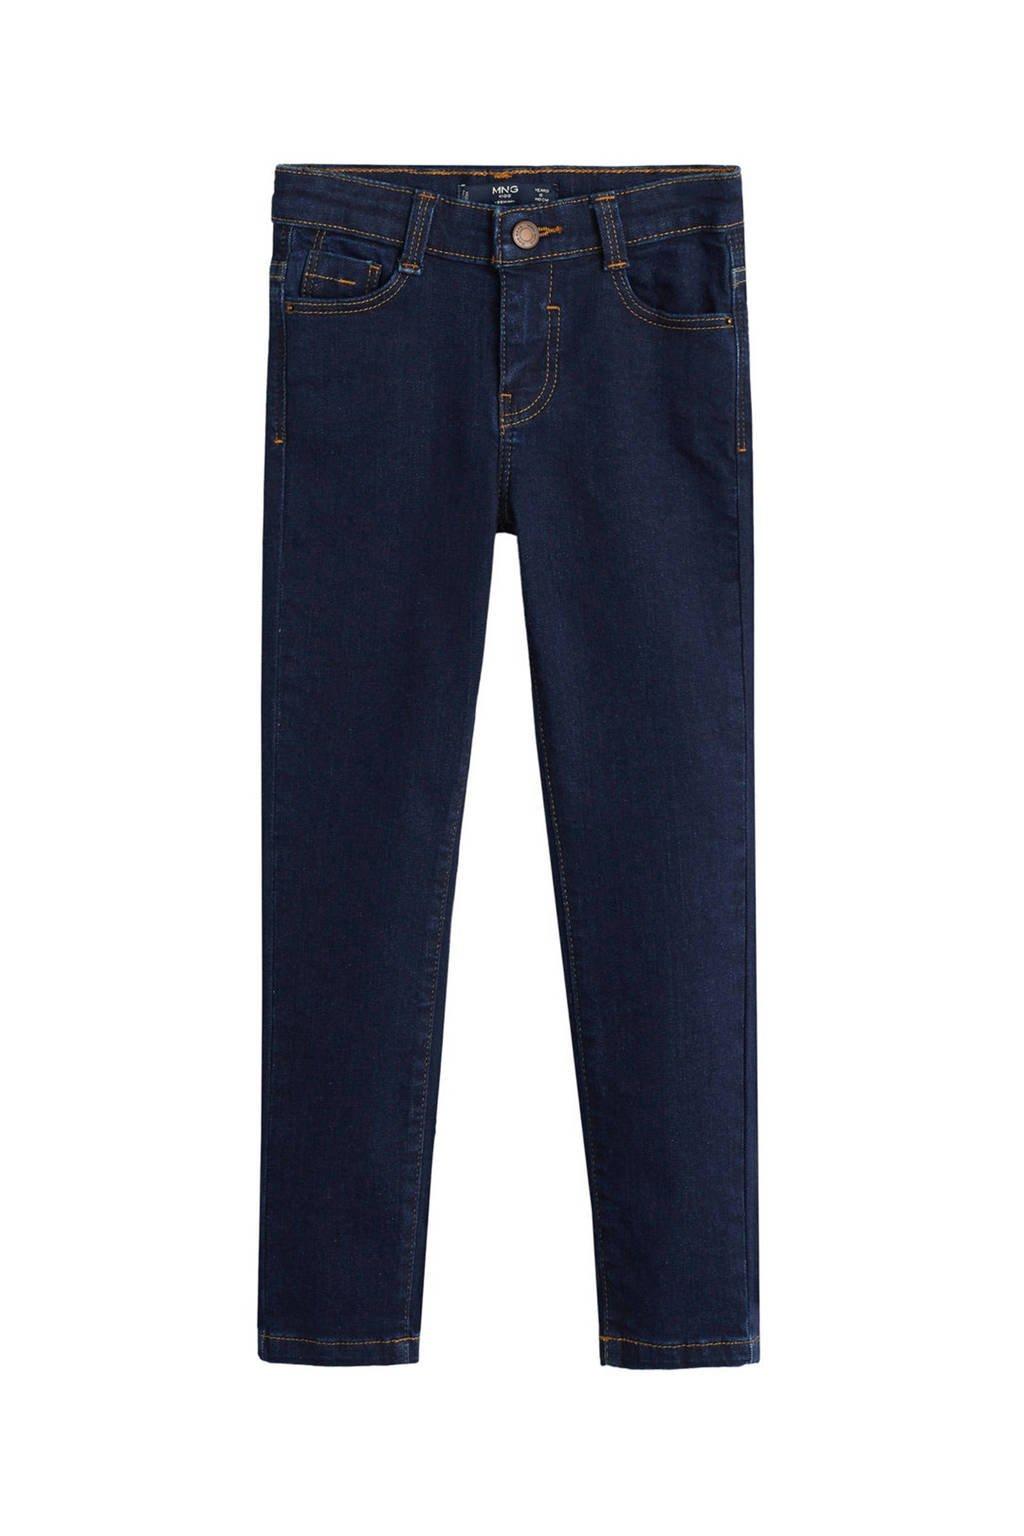 Mango Kids straight fit jeans dark denim, Dark denim